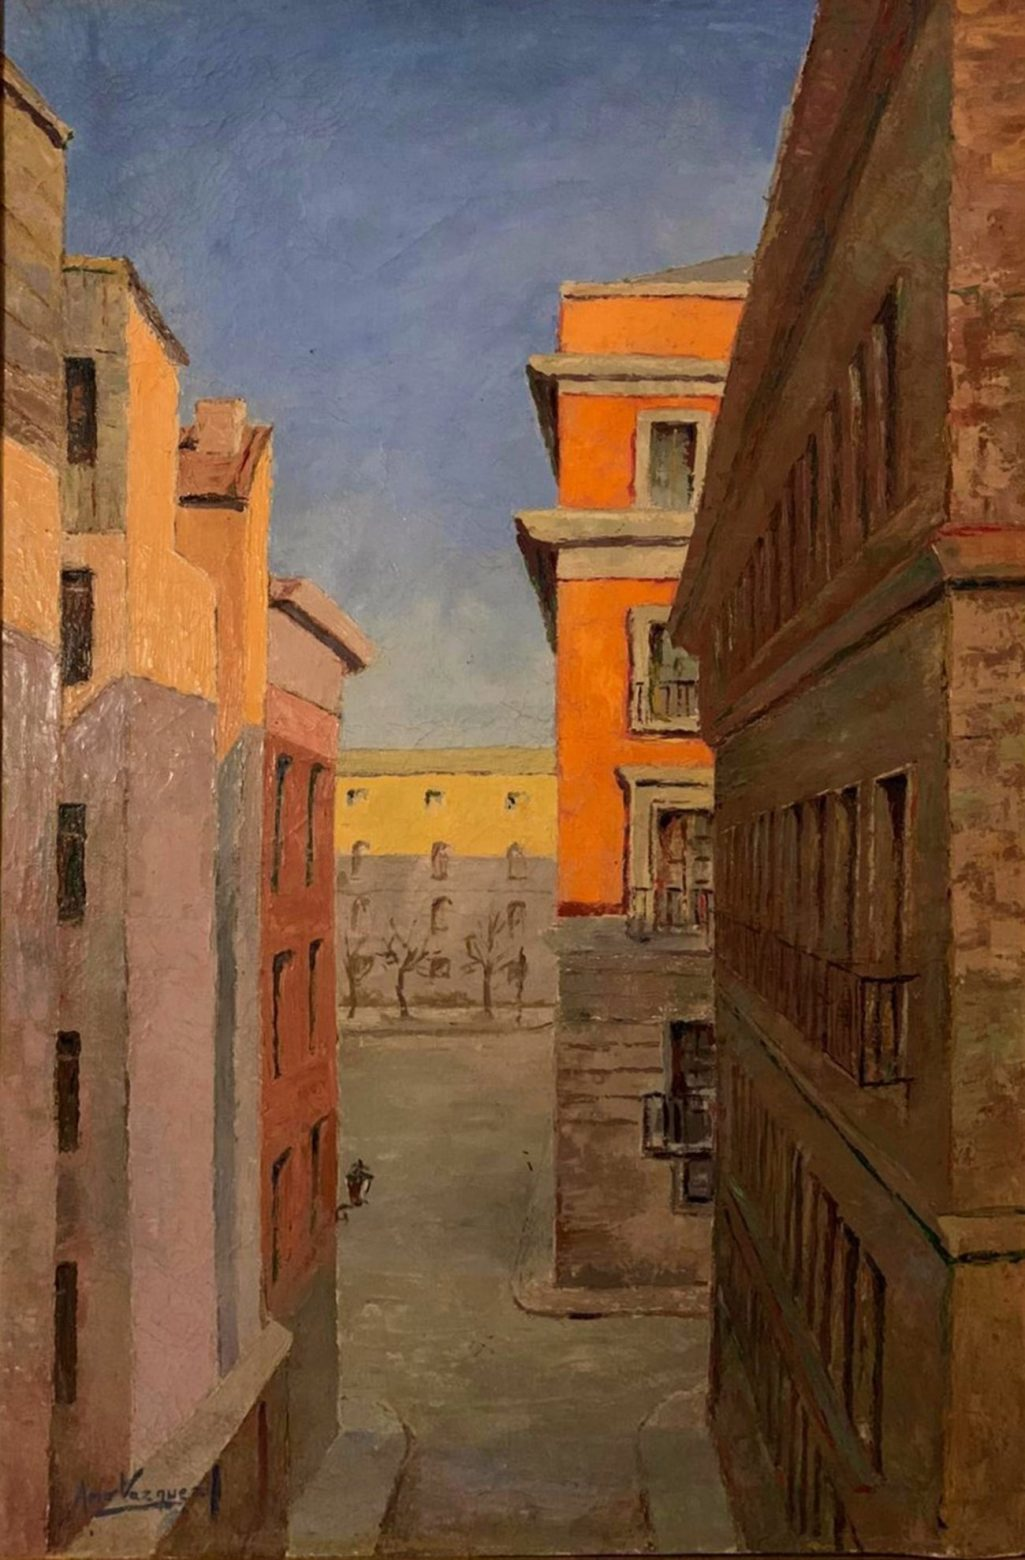 Juan Amo. (1955). Calle de Madrid. Óleo - Lienzo. 120 x 70. Colección Privada.